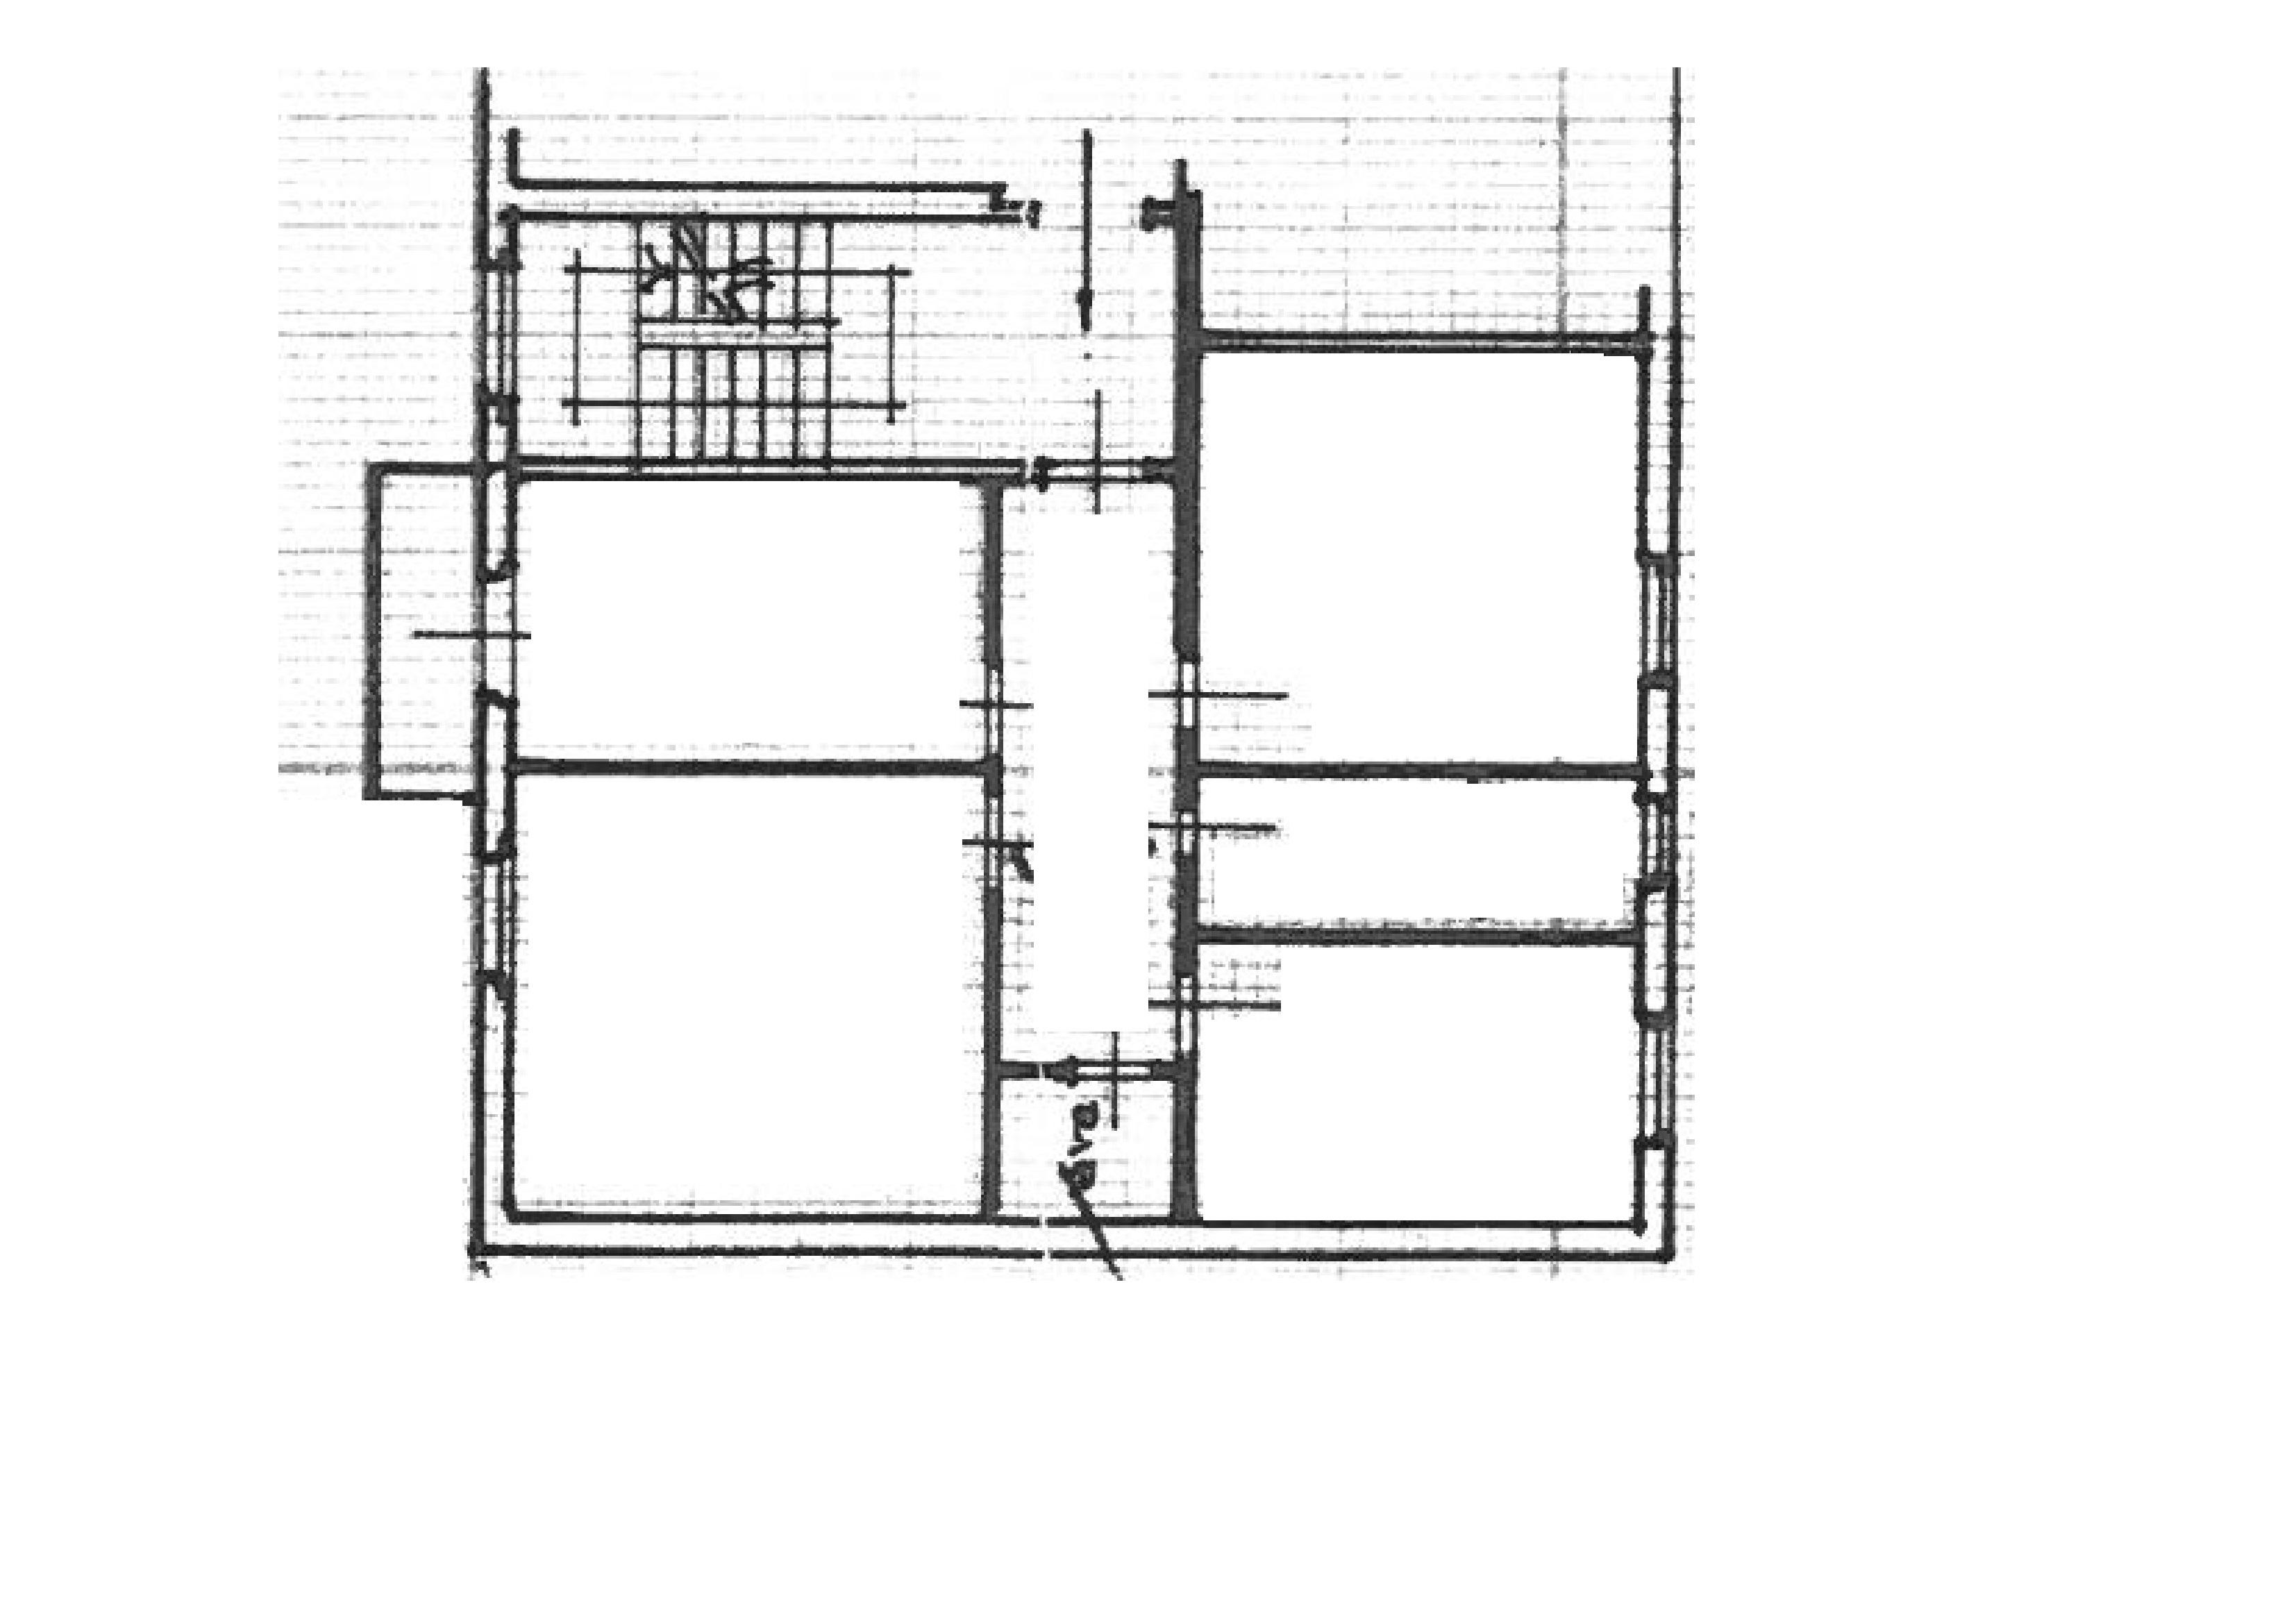 Appartamento in vendita, rif. K142 (Planimetria 1/1)